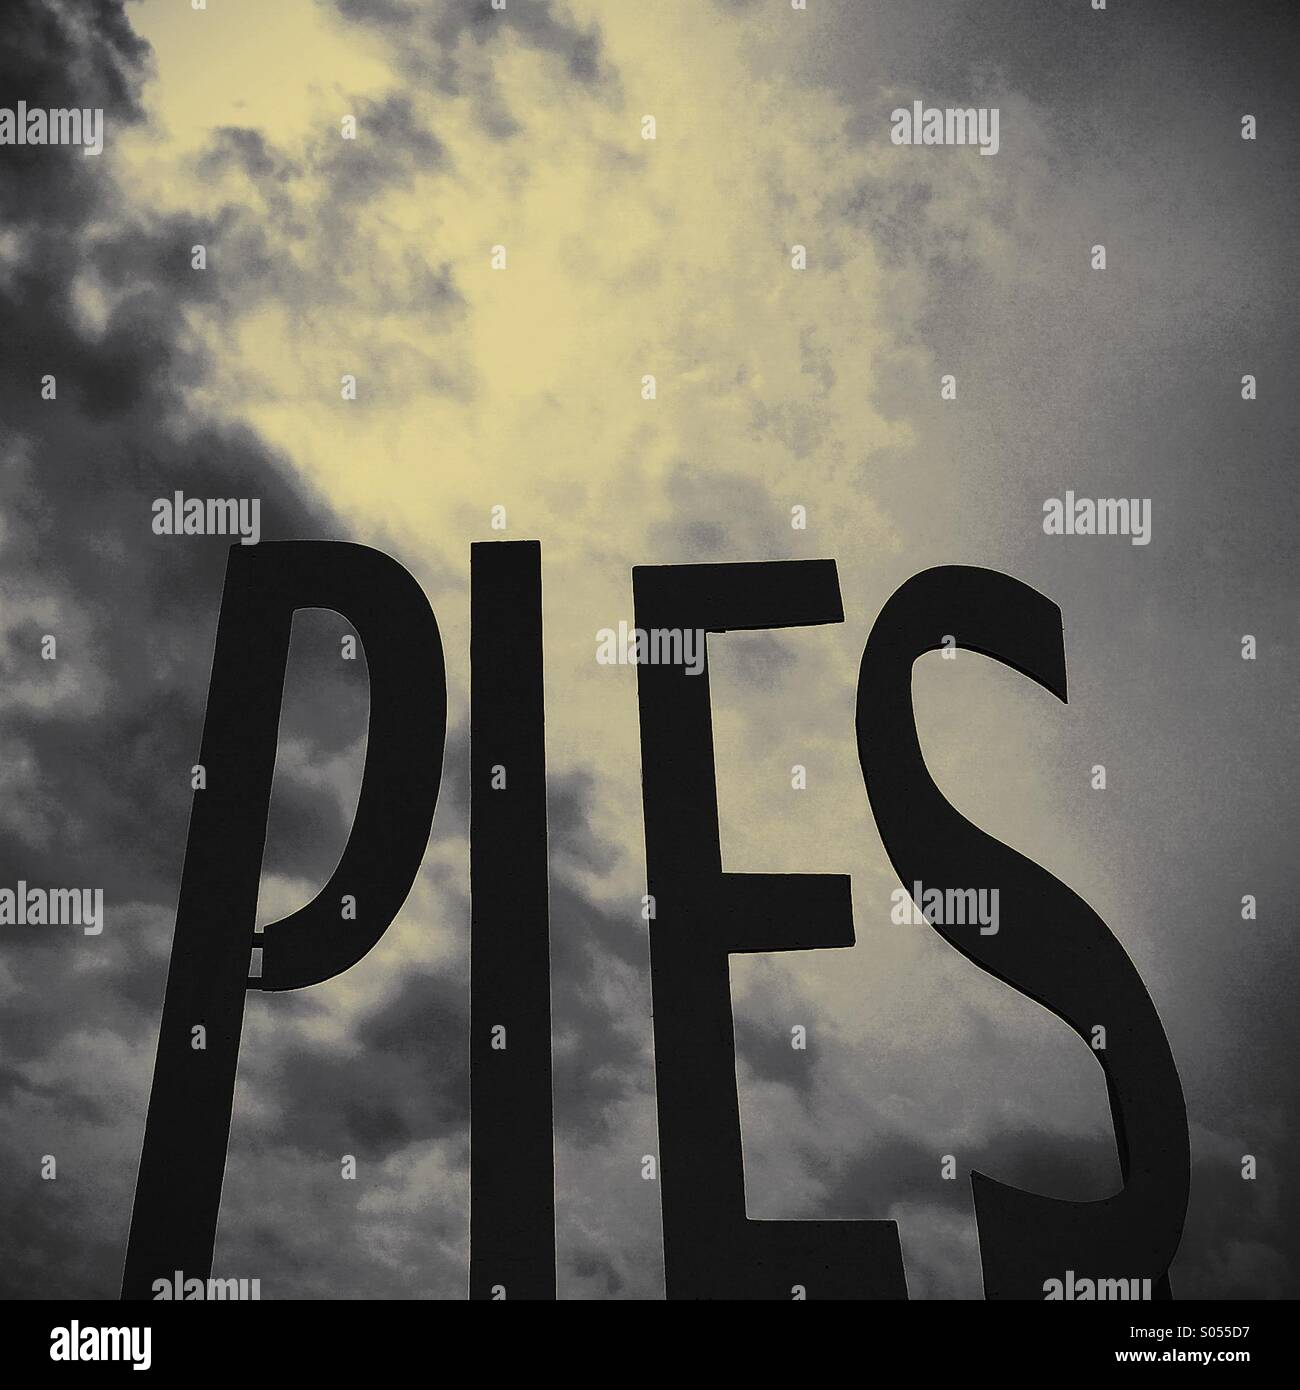 Pie in the sky - Stock Image